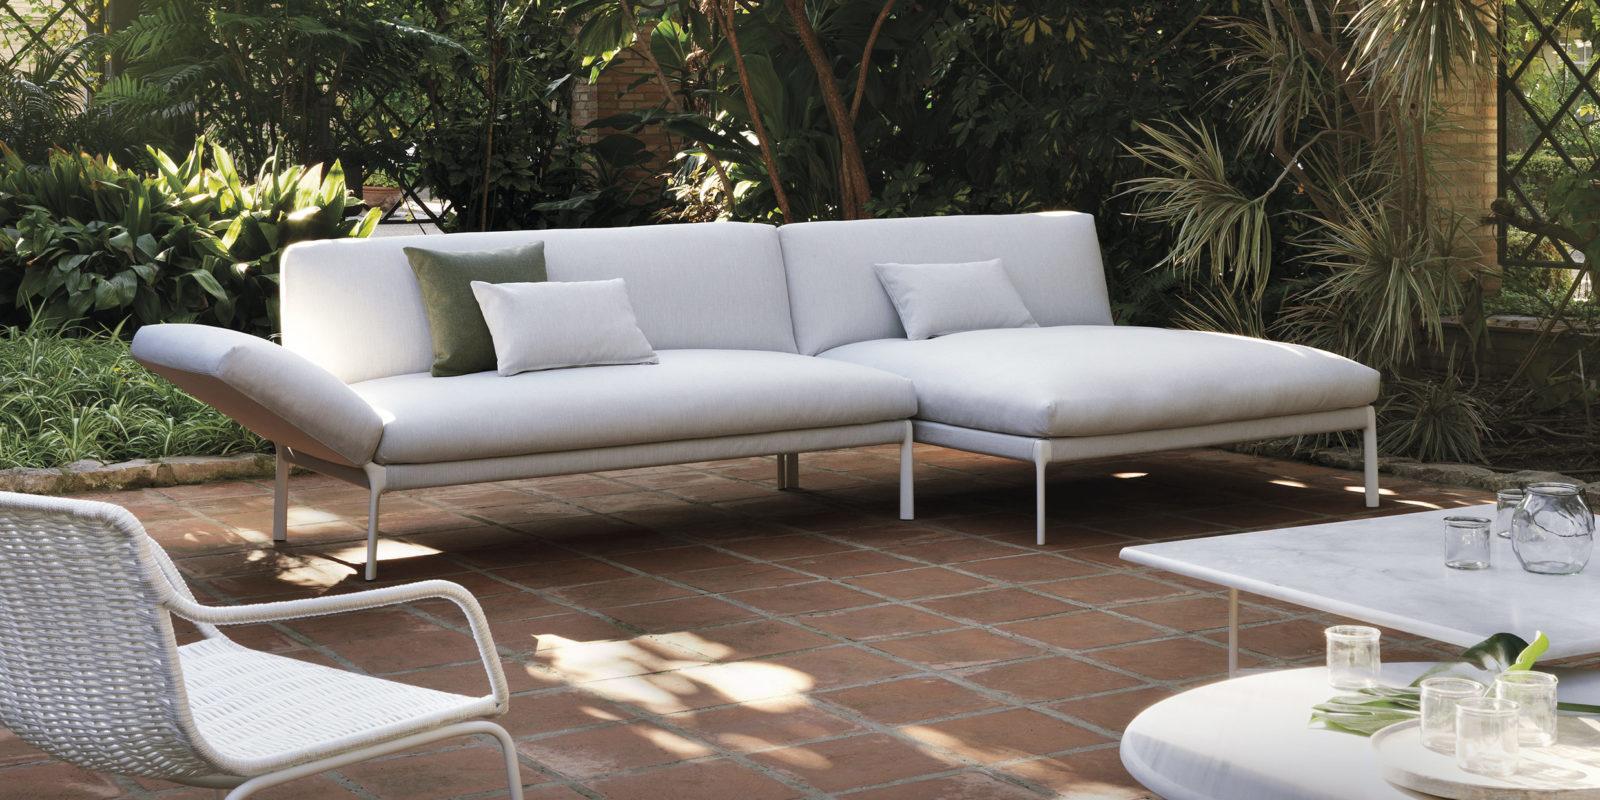 mobilier outdoor luxe jardin extrieur en photos stahl im garten fahrion und partner gartenbau. Black Bedroom Furniture Sets. Home Design Ideas